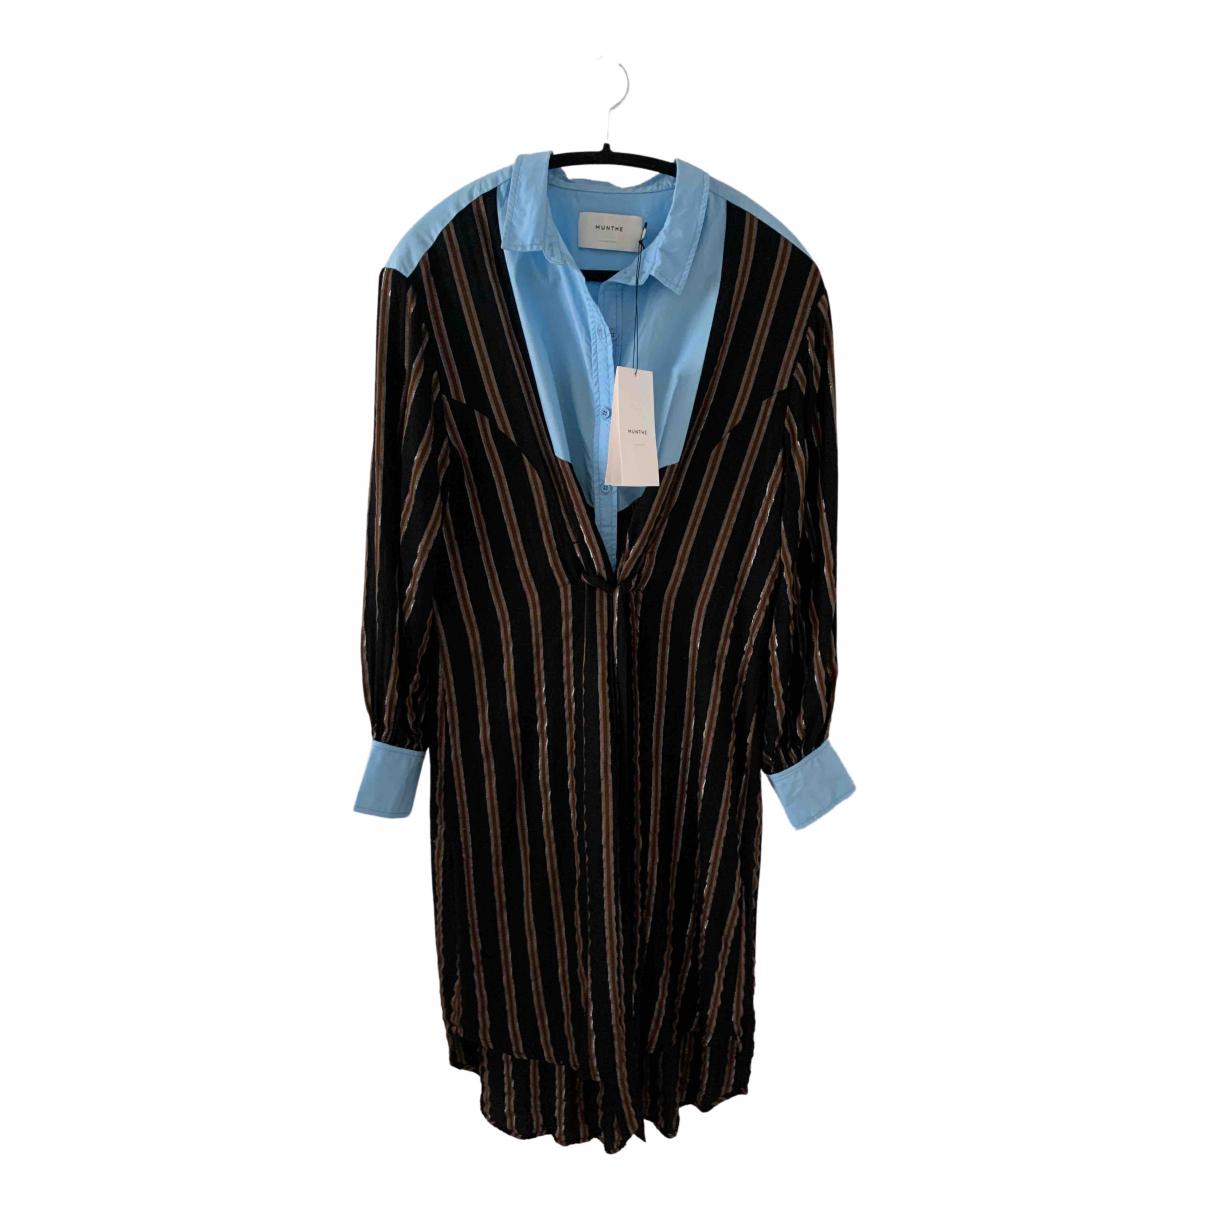 Munthe \N Brown Cotton dress for Women S International